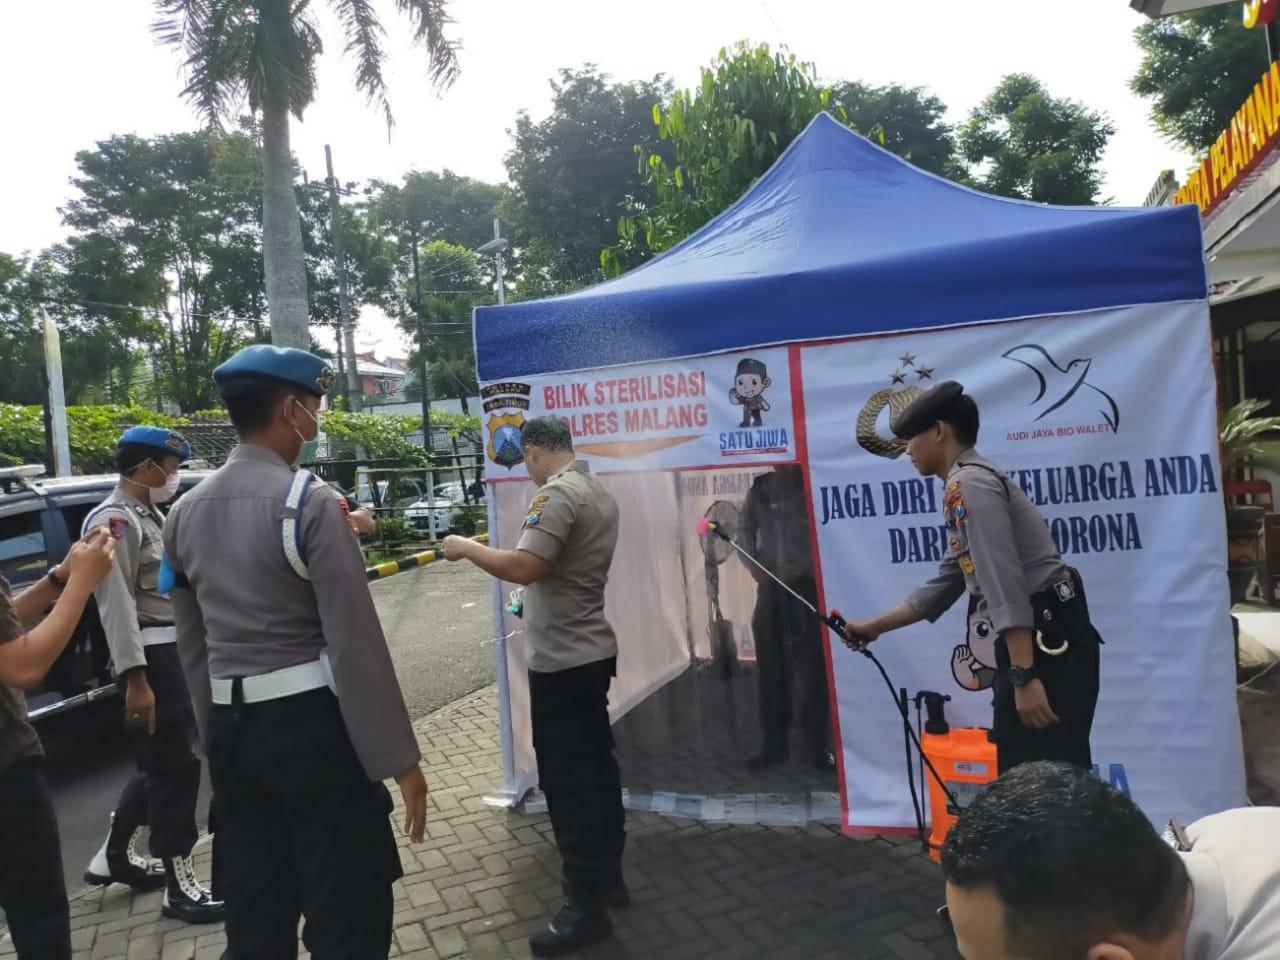 Putus Penyebaran Covid-19, Polres Malang Pasang Bilik Sterilisasi Disinfektan